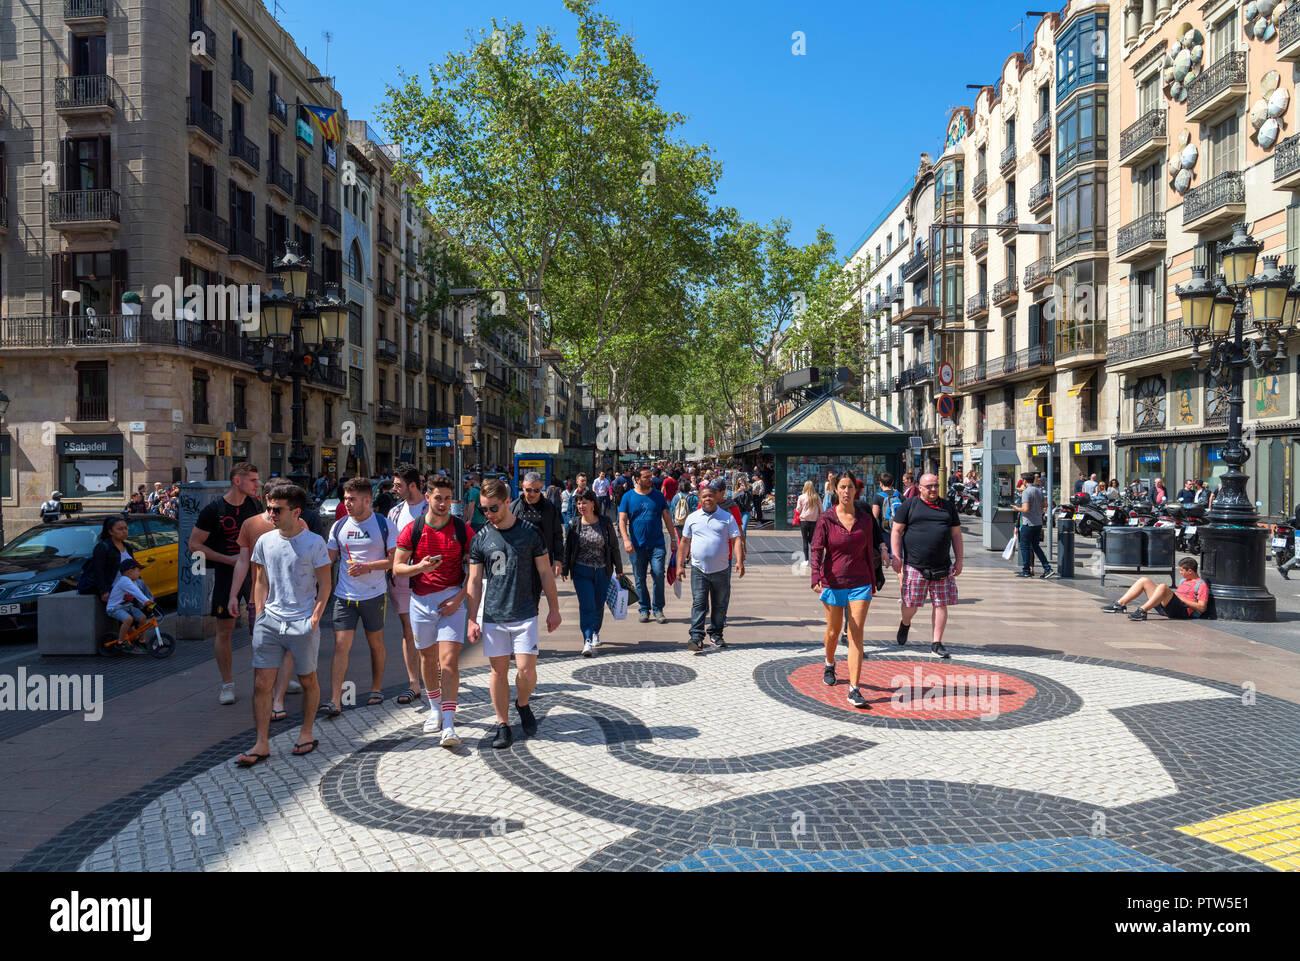 Joan Miro's mosaic on Pla de l'Os, Las Ramblas, Barcelona, Catalunya, Spain. - Stock Image